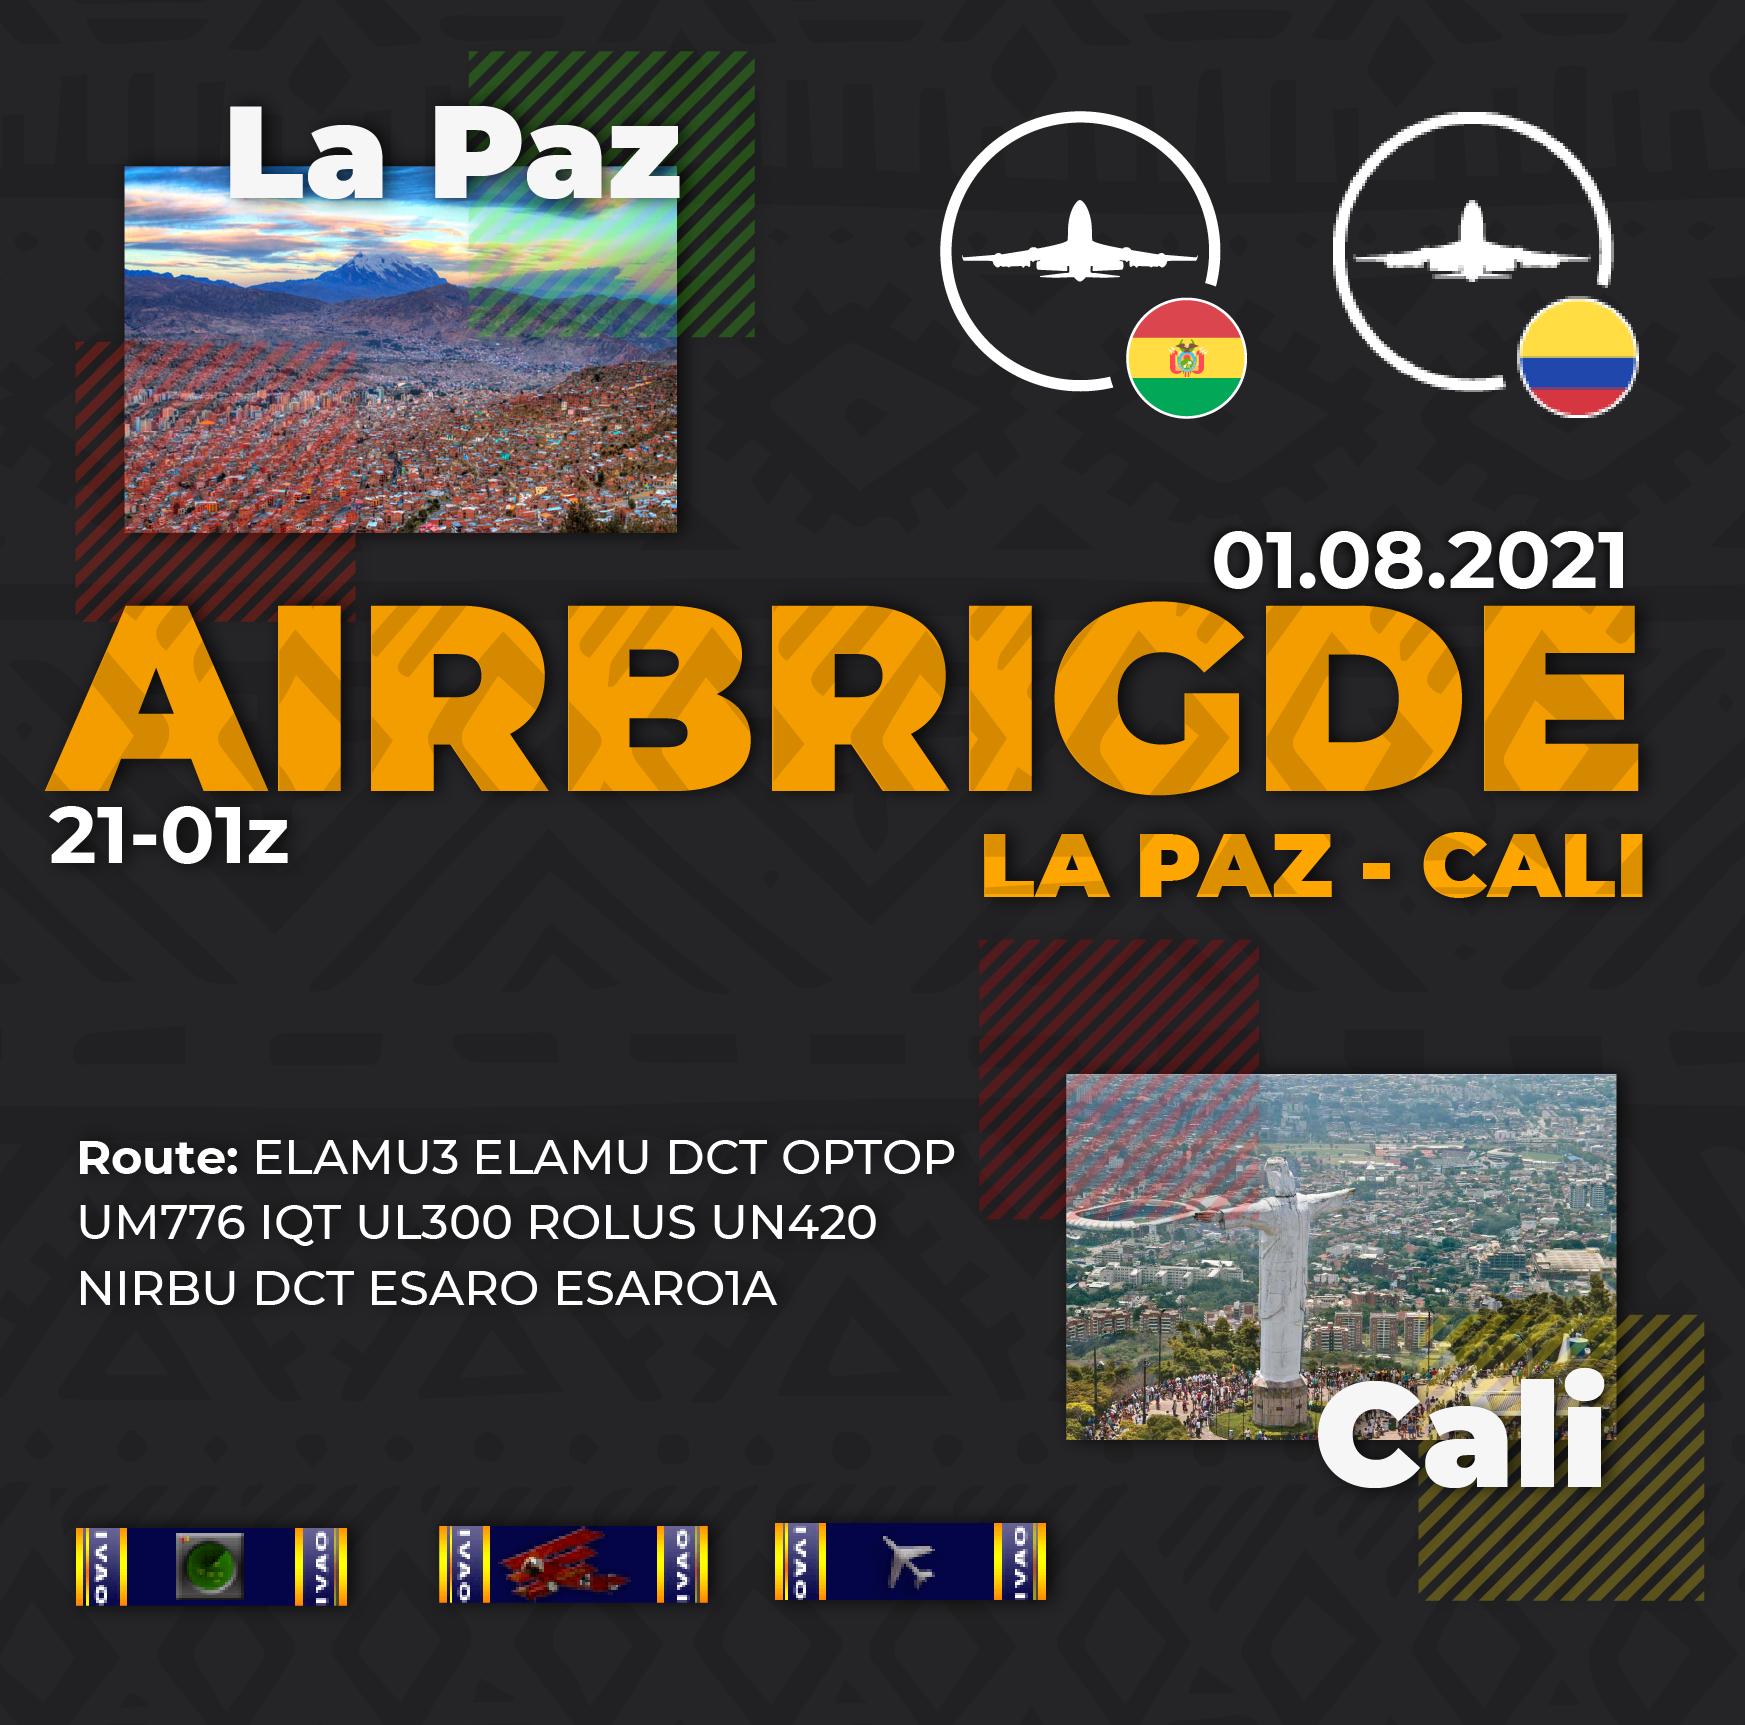 [CO+BO] Airbridge La Paz and Cali